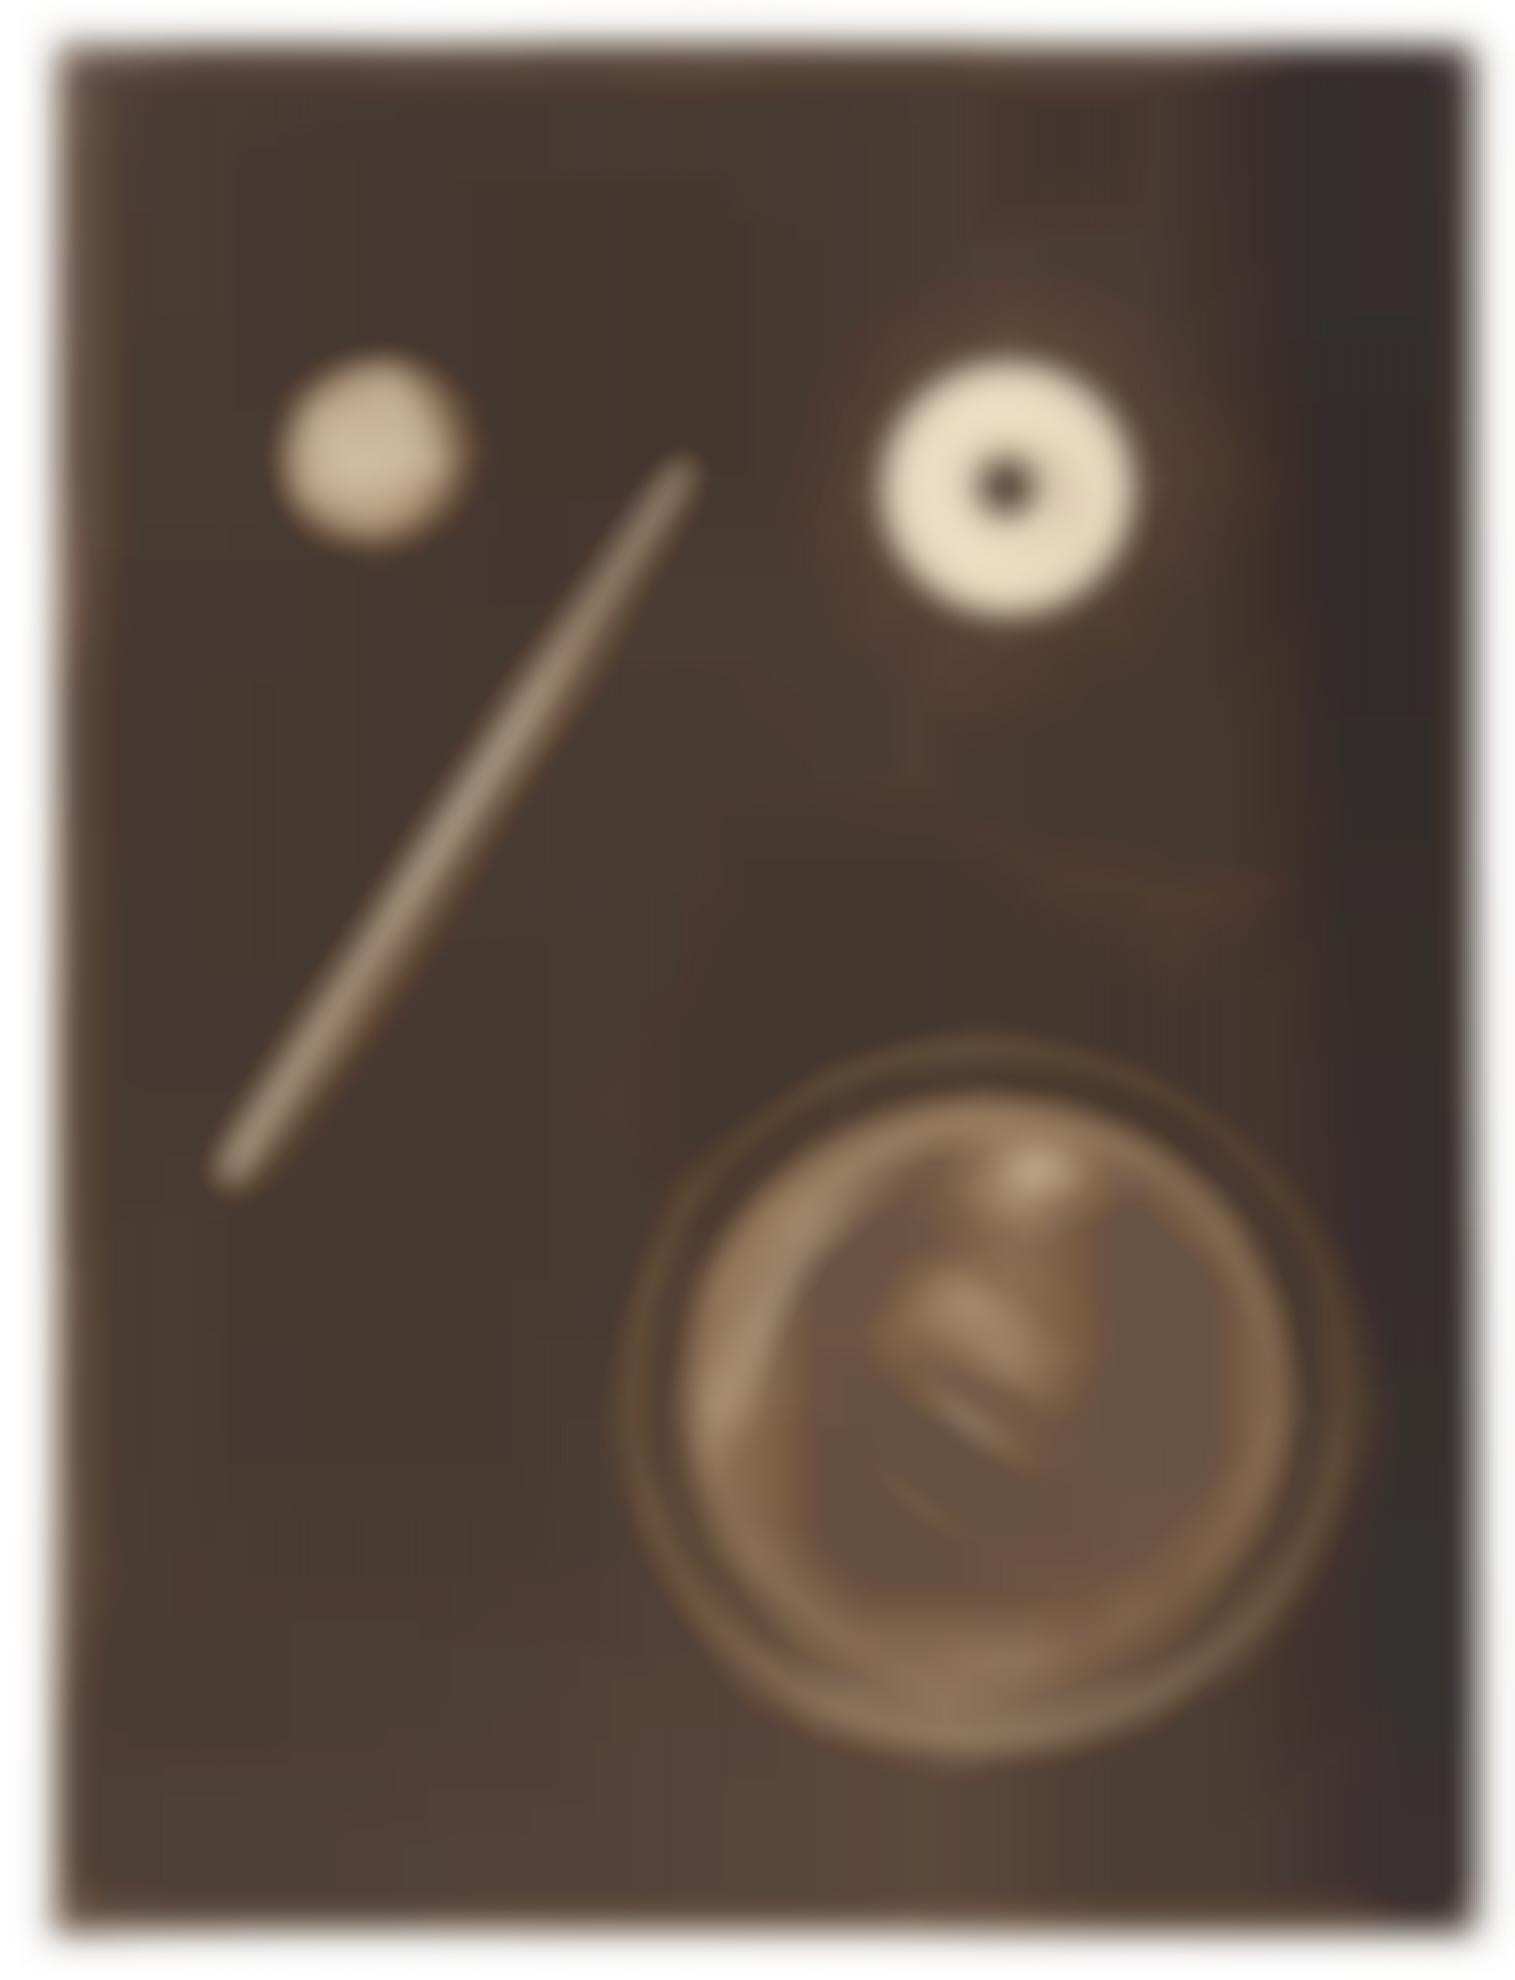 Laszlo Moholy-Nagy-Untitled (Photogram With Circular Shapes And Diagonal Line)-1925